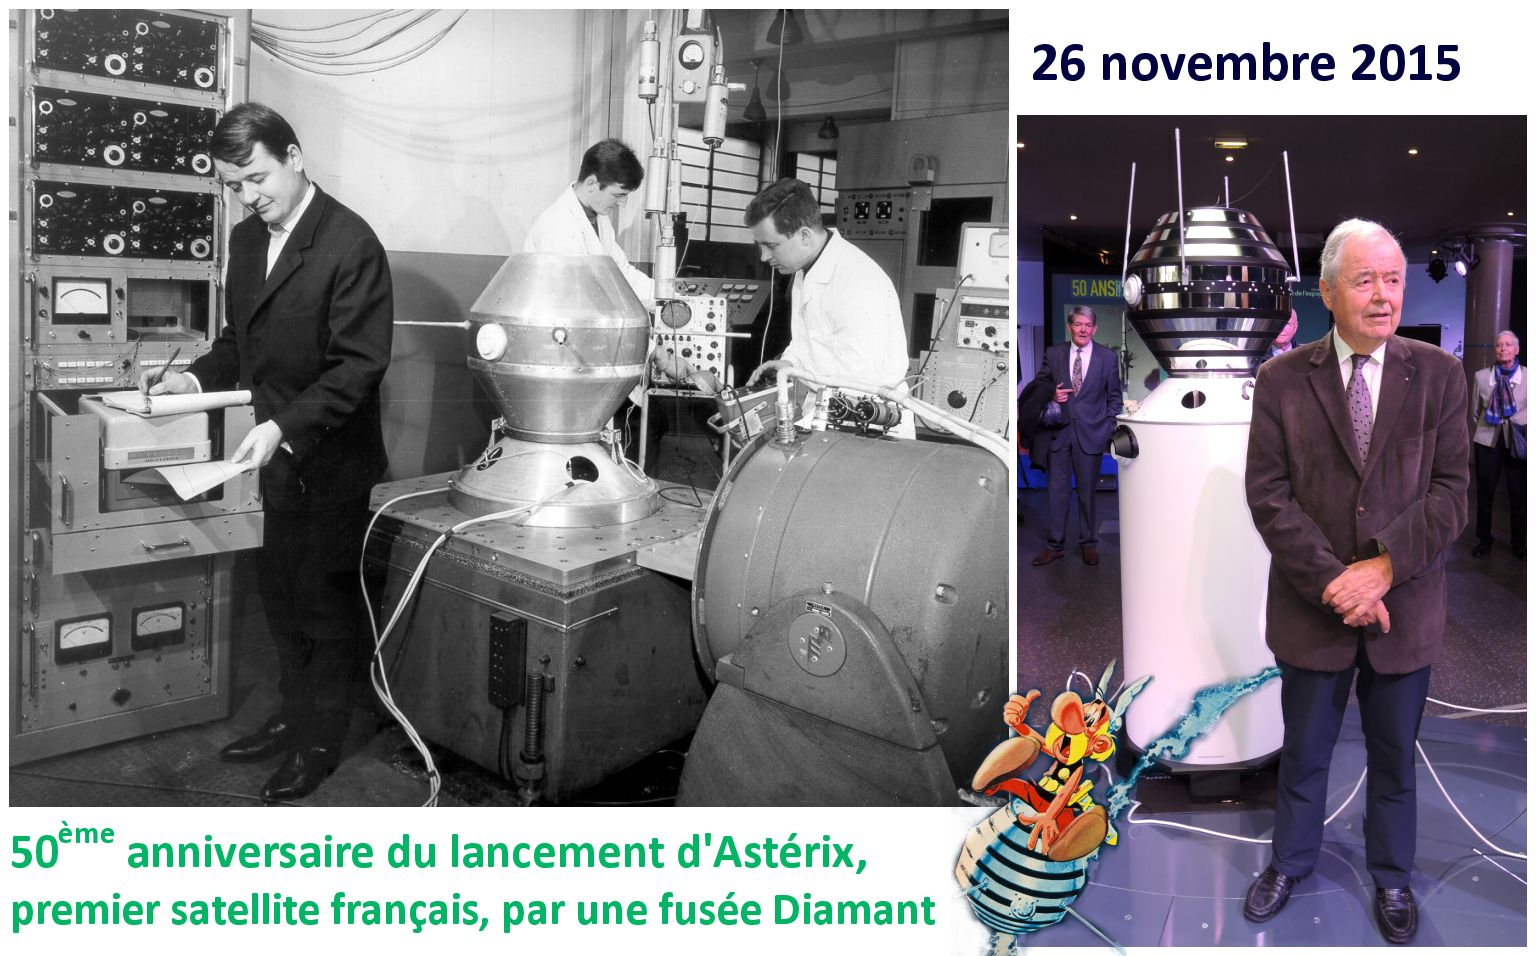 Astérix - A1 - Diamant-A - Intégration - Anniversaire - George Estibal - Matra